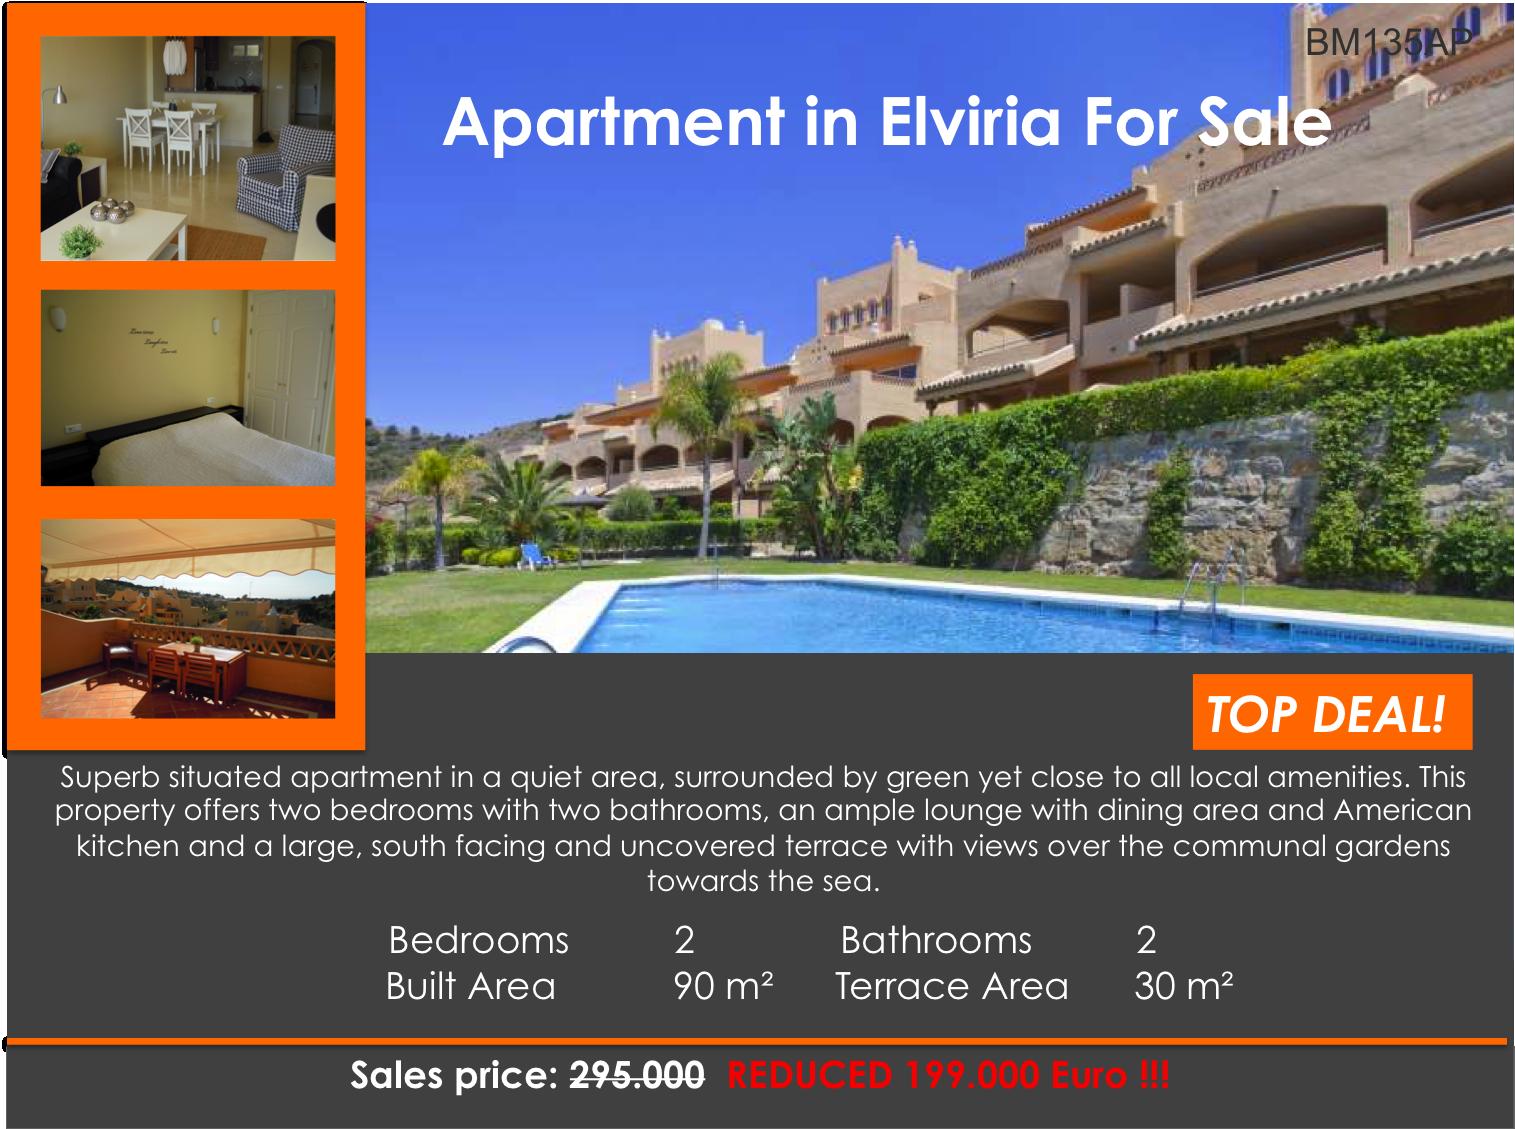 Second Home in Elviria - Marbella -  Top Deal!